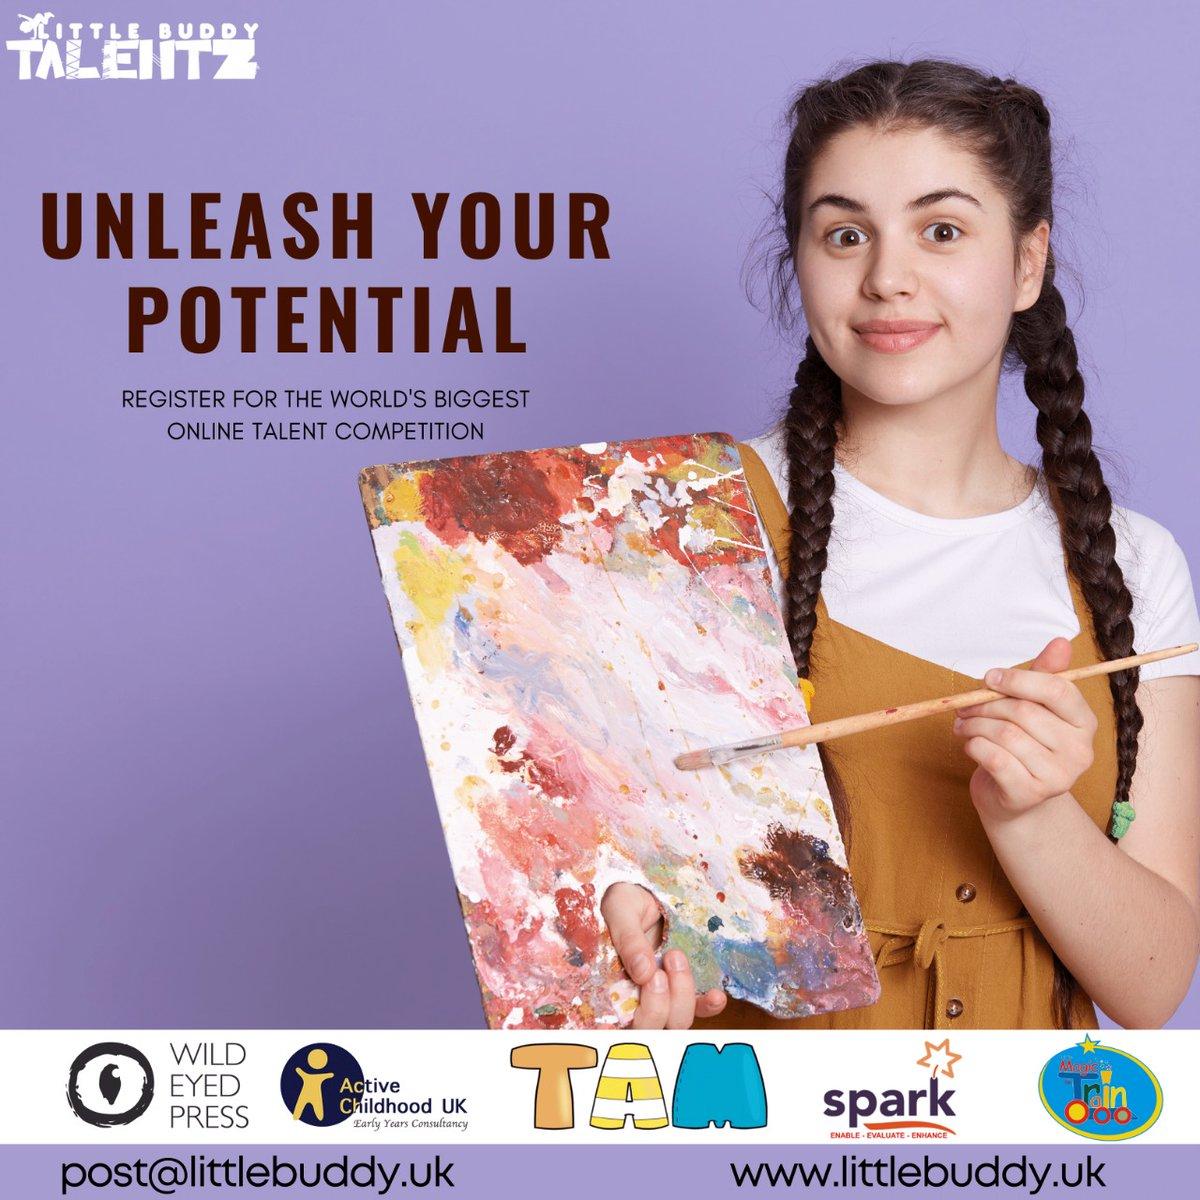 Celebrate creativity! Children 2.5-18 yrs Who could get involved? #PlaytoZ #littlemagictrain #yoginistraining #ActiveChildhood #tamsjourney #wideeyepress #sparkearlyyears  #lockdown2020 #EYFS @eymatters @SchemaPlay  / BIO